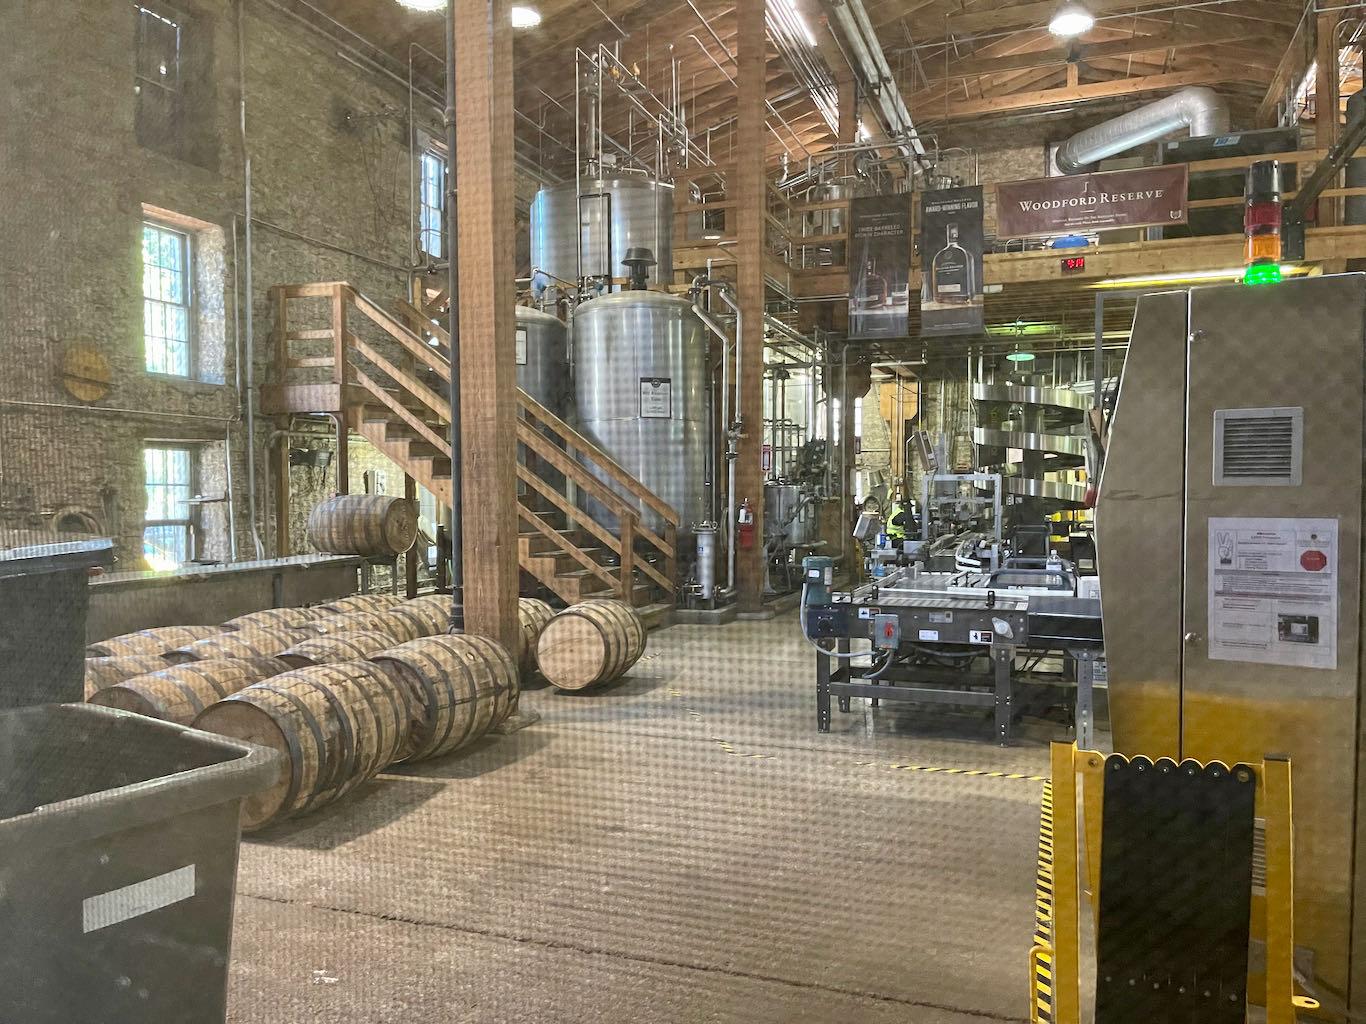 Barrel Dumping - Woodford Reserve Distillery